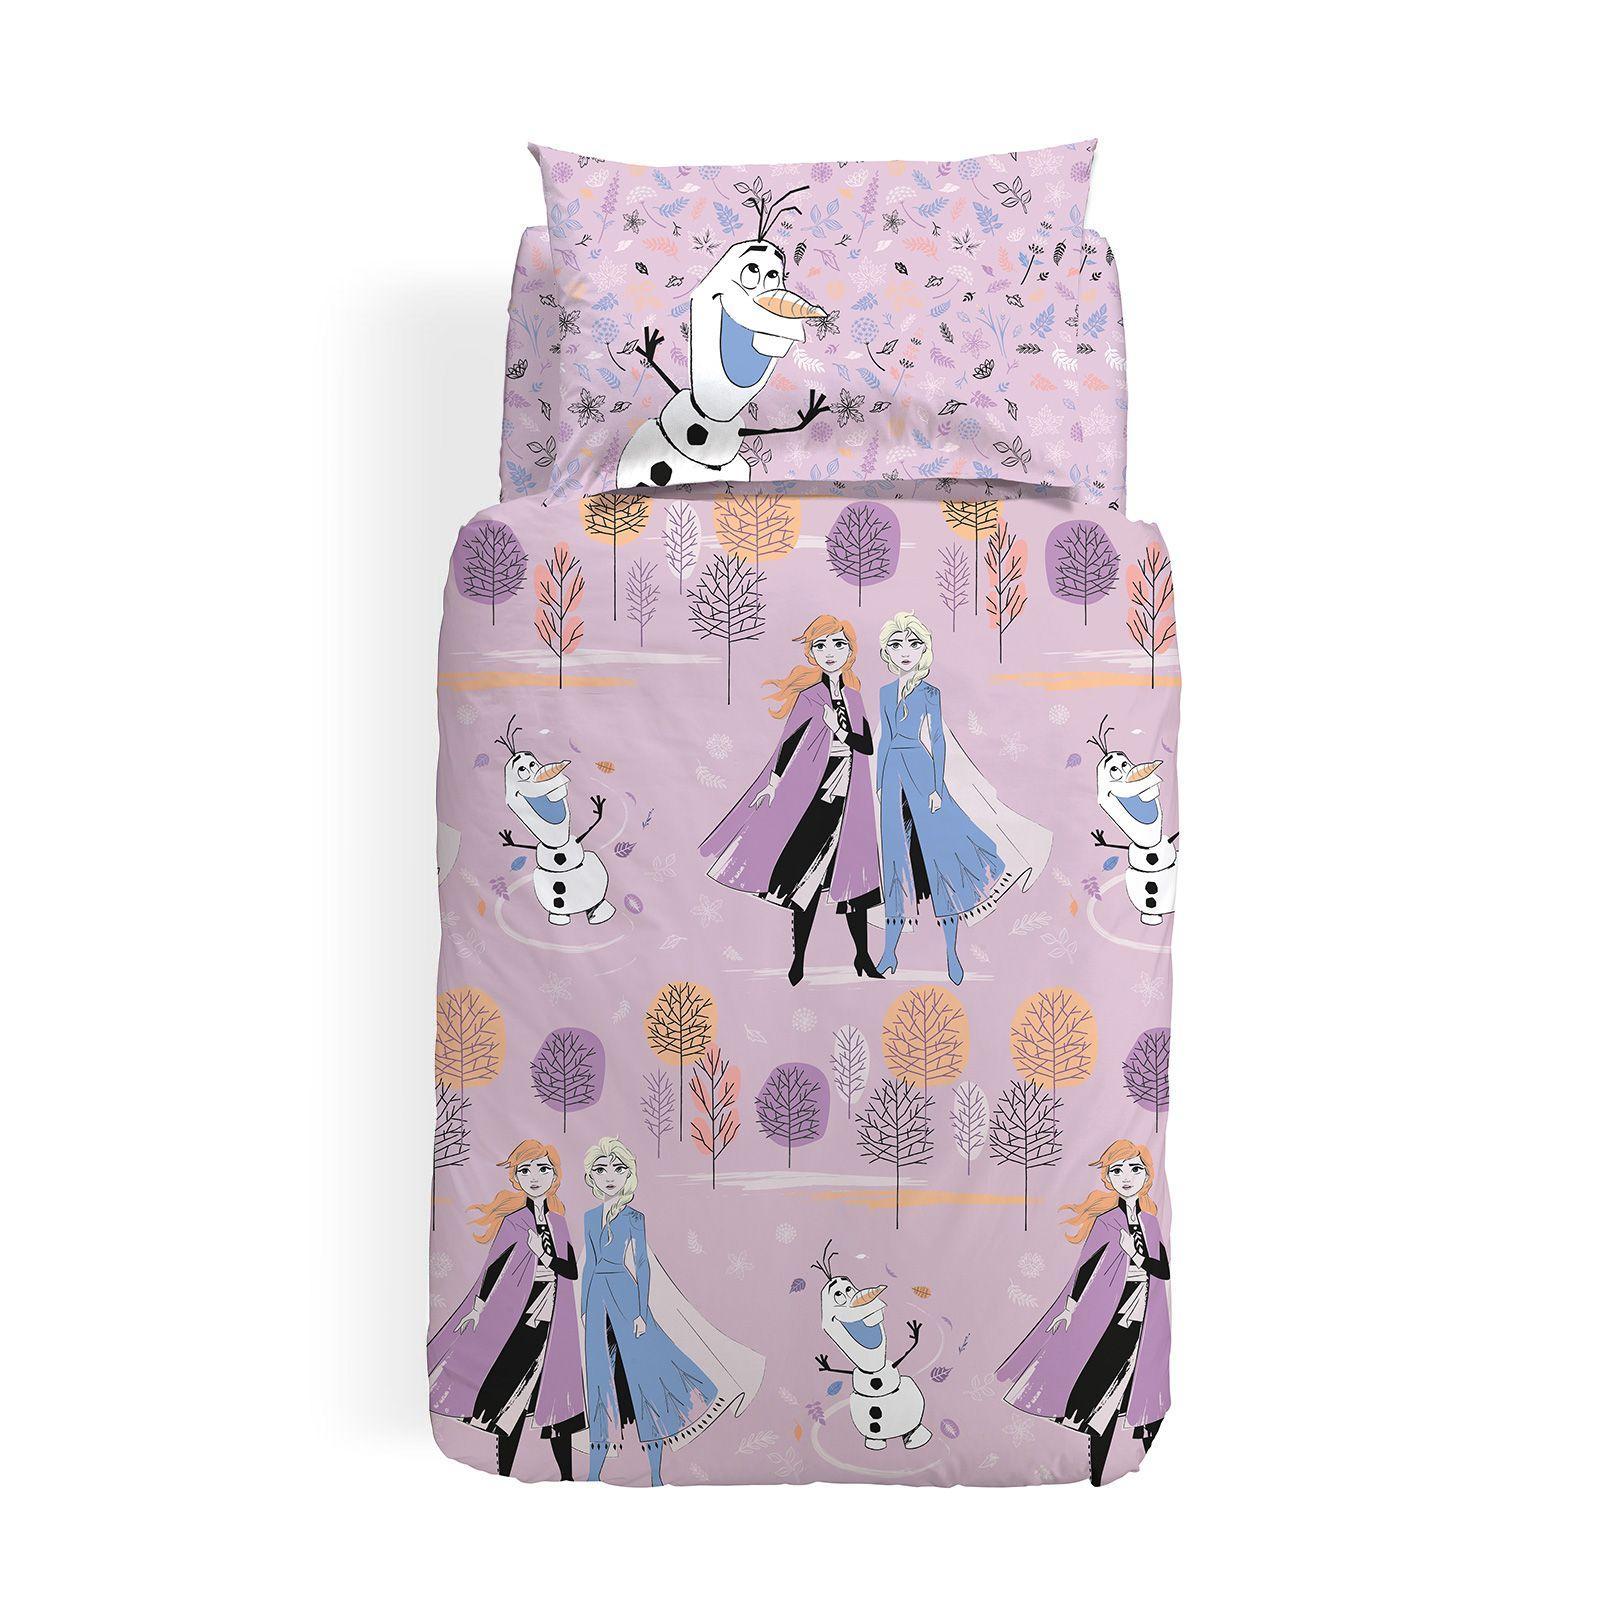 Frozen Duvet Cover Single Bed 1piazza Disney Caleffi Mythic